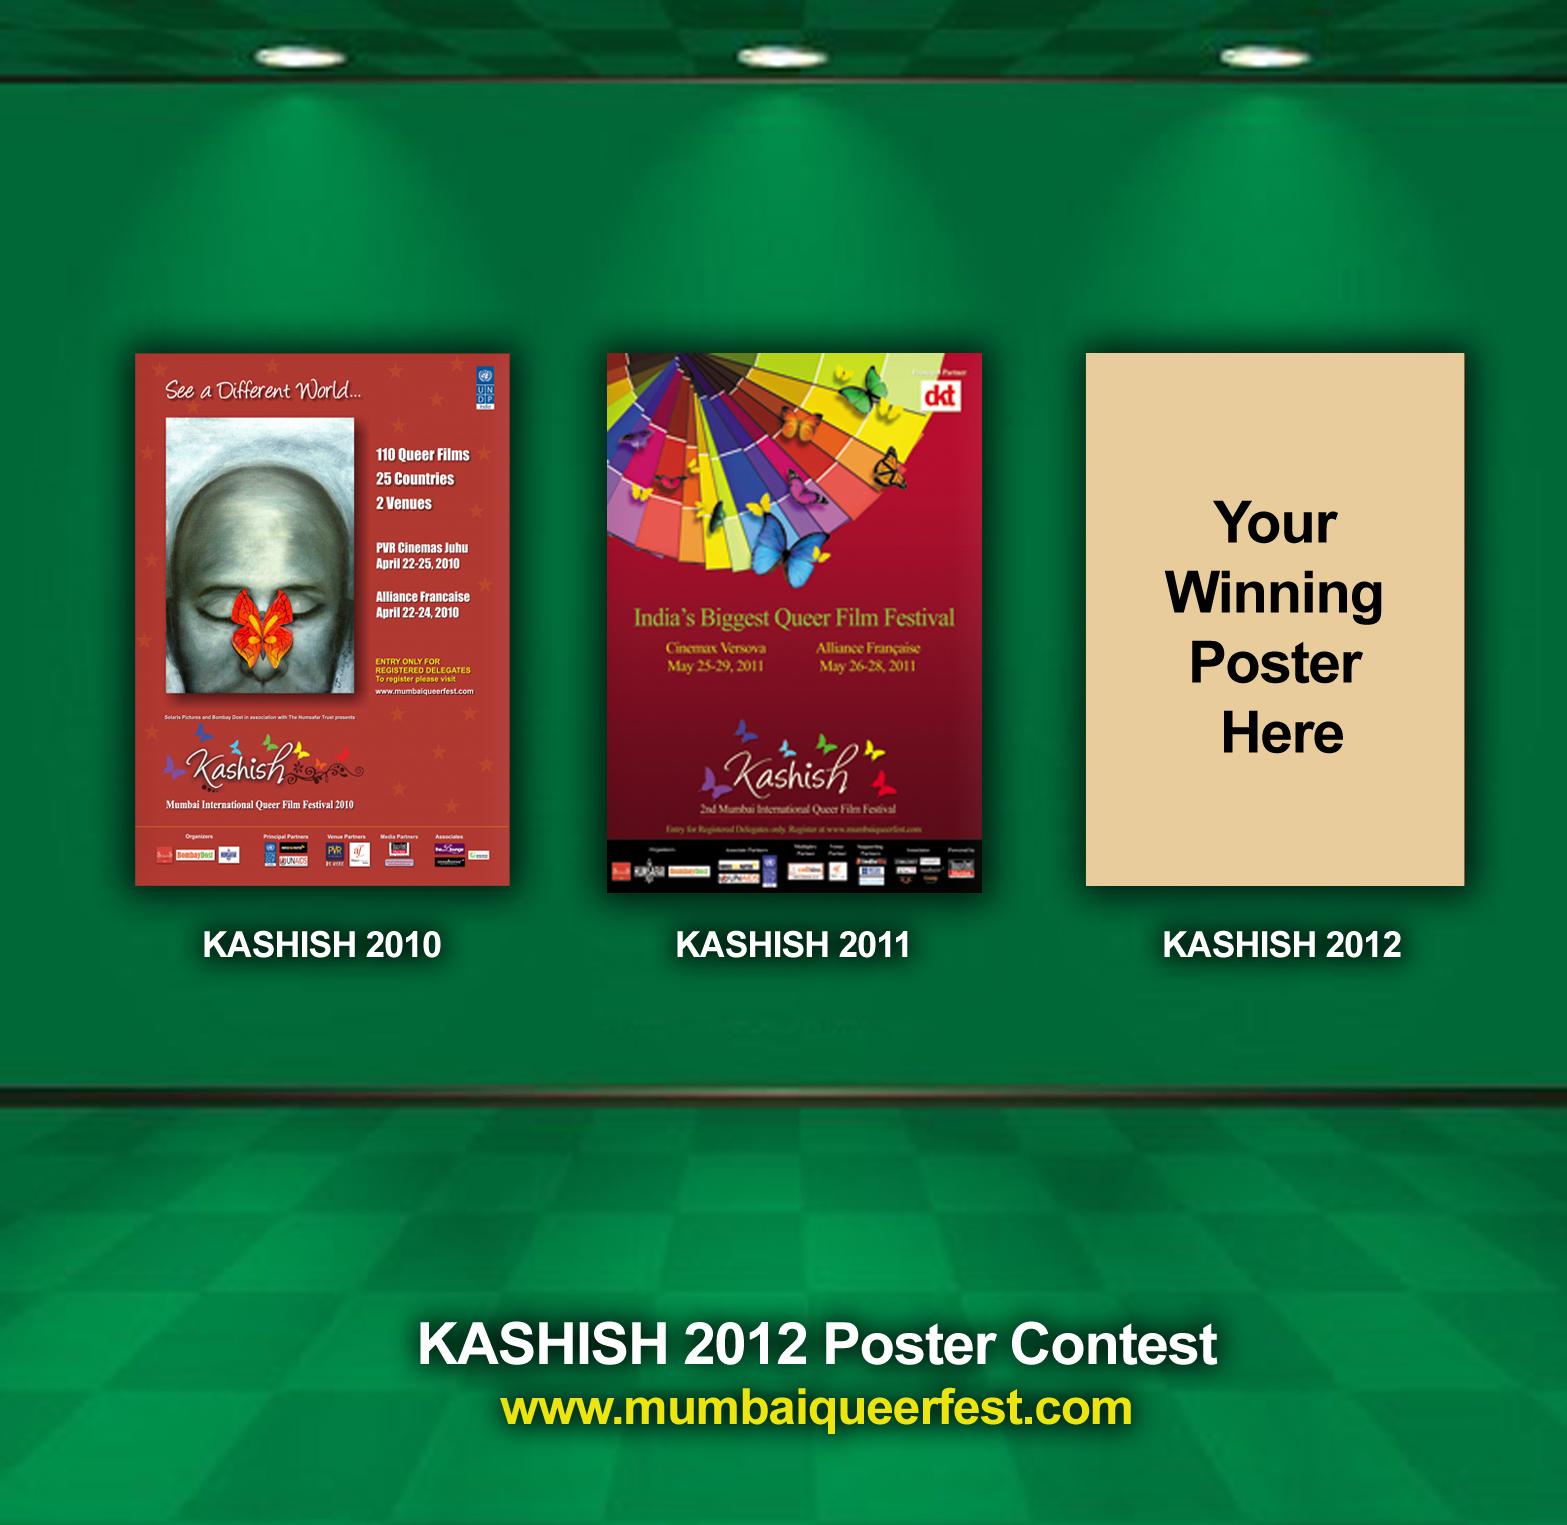 http://1.bp.blogspot.com/-54-Gqu50HTw/T1fpONL2KzI/AAAAAAAAe7c/hSQ4_QHhzks/s1600/KASHISH2012+Poster+Contest.jpg